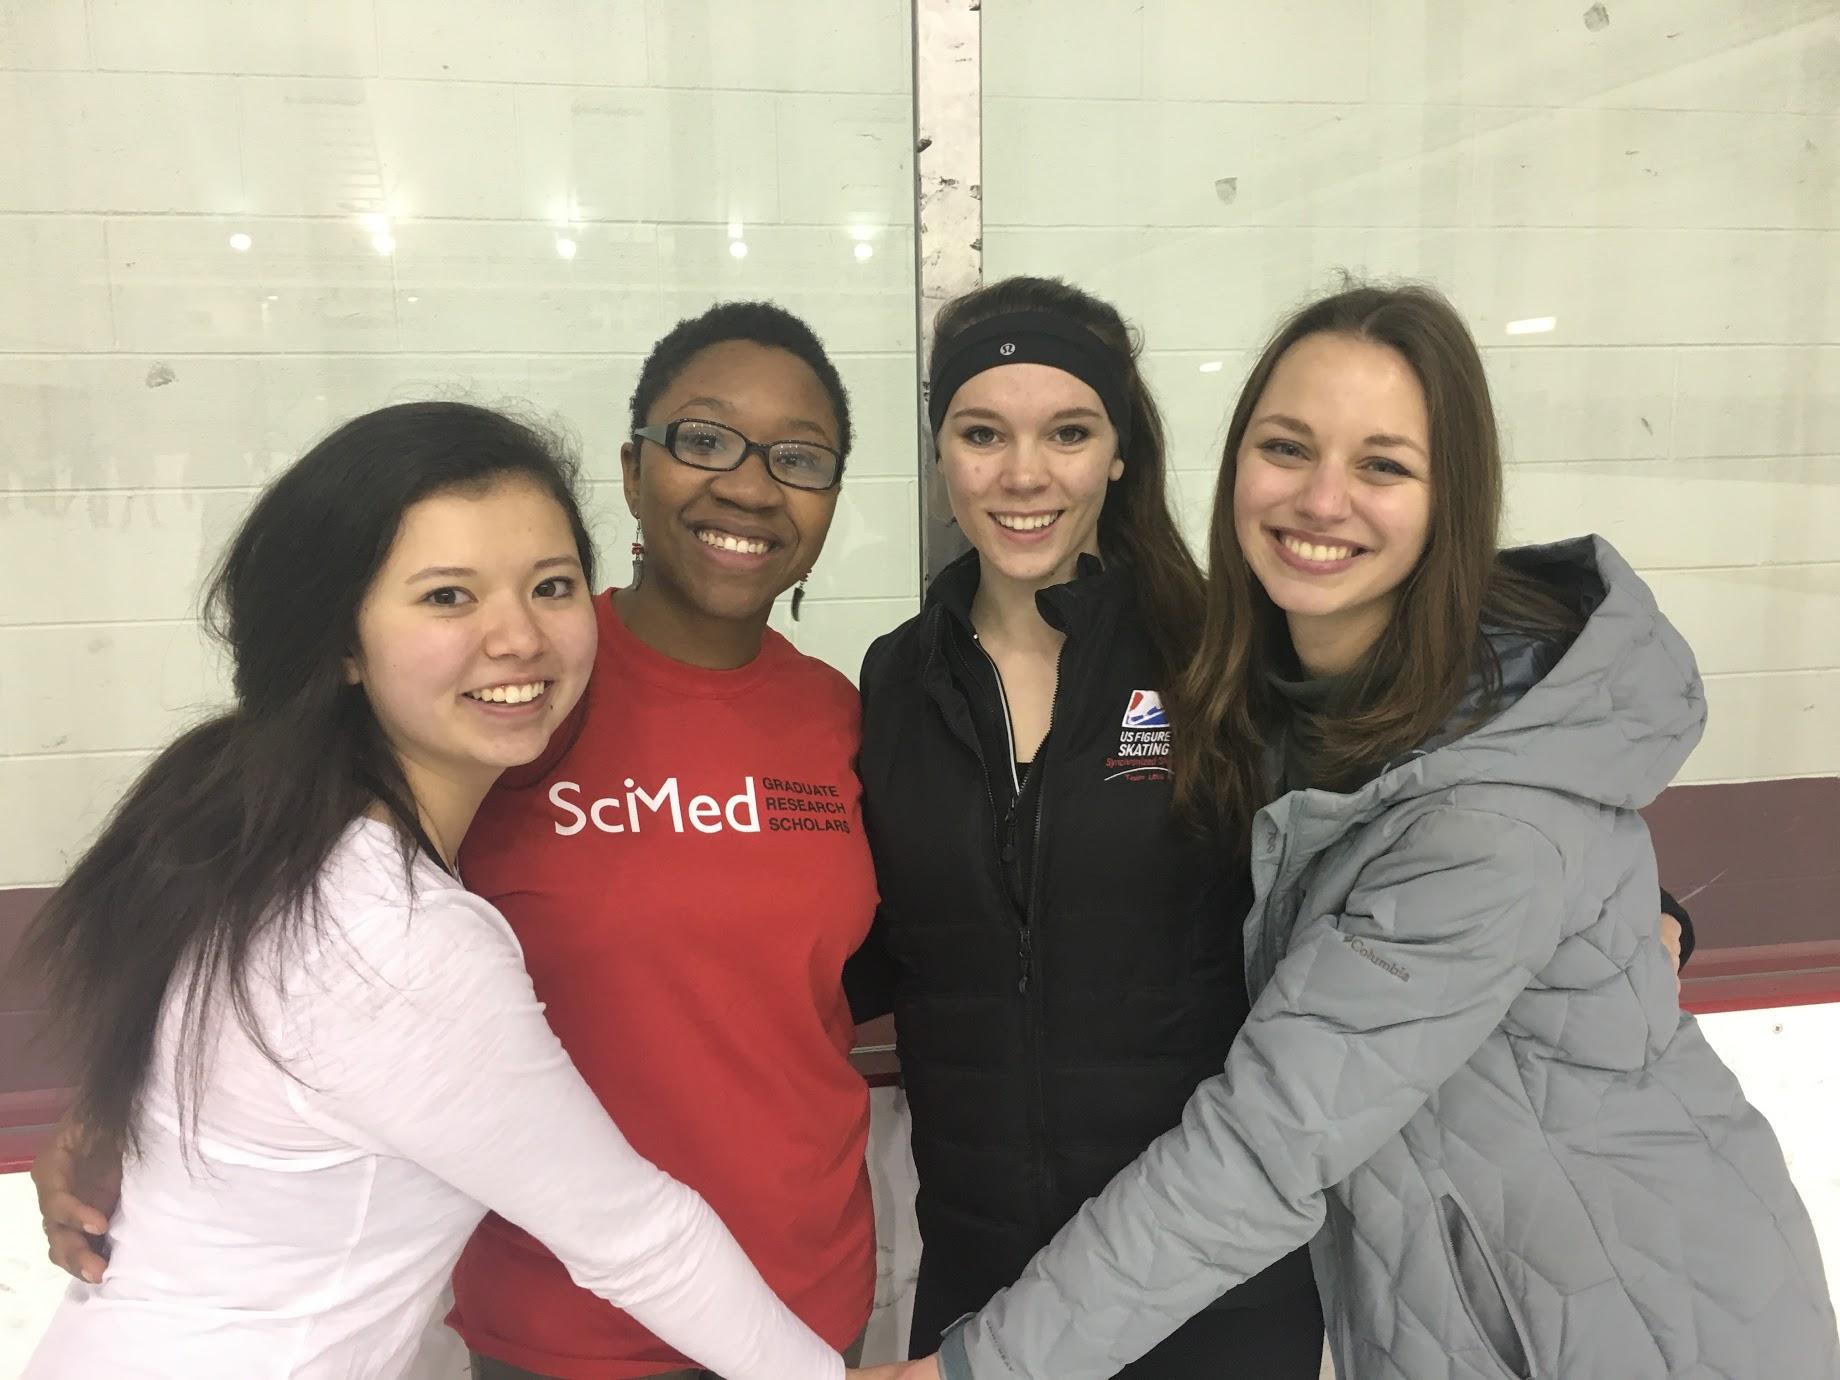 Tiaira's first time ice skating!